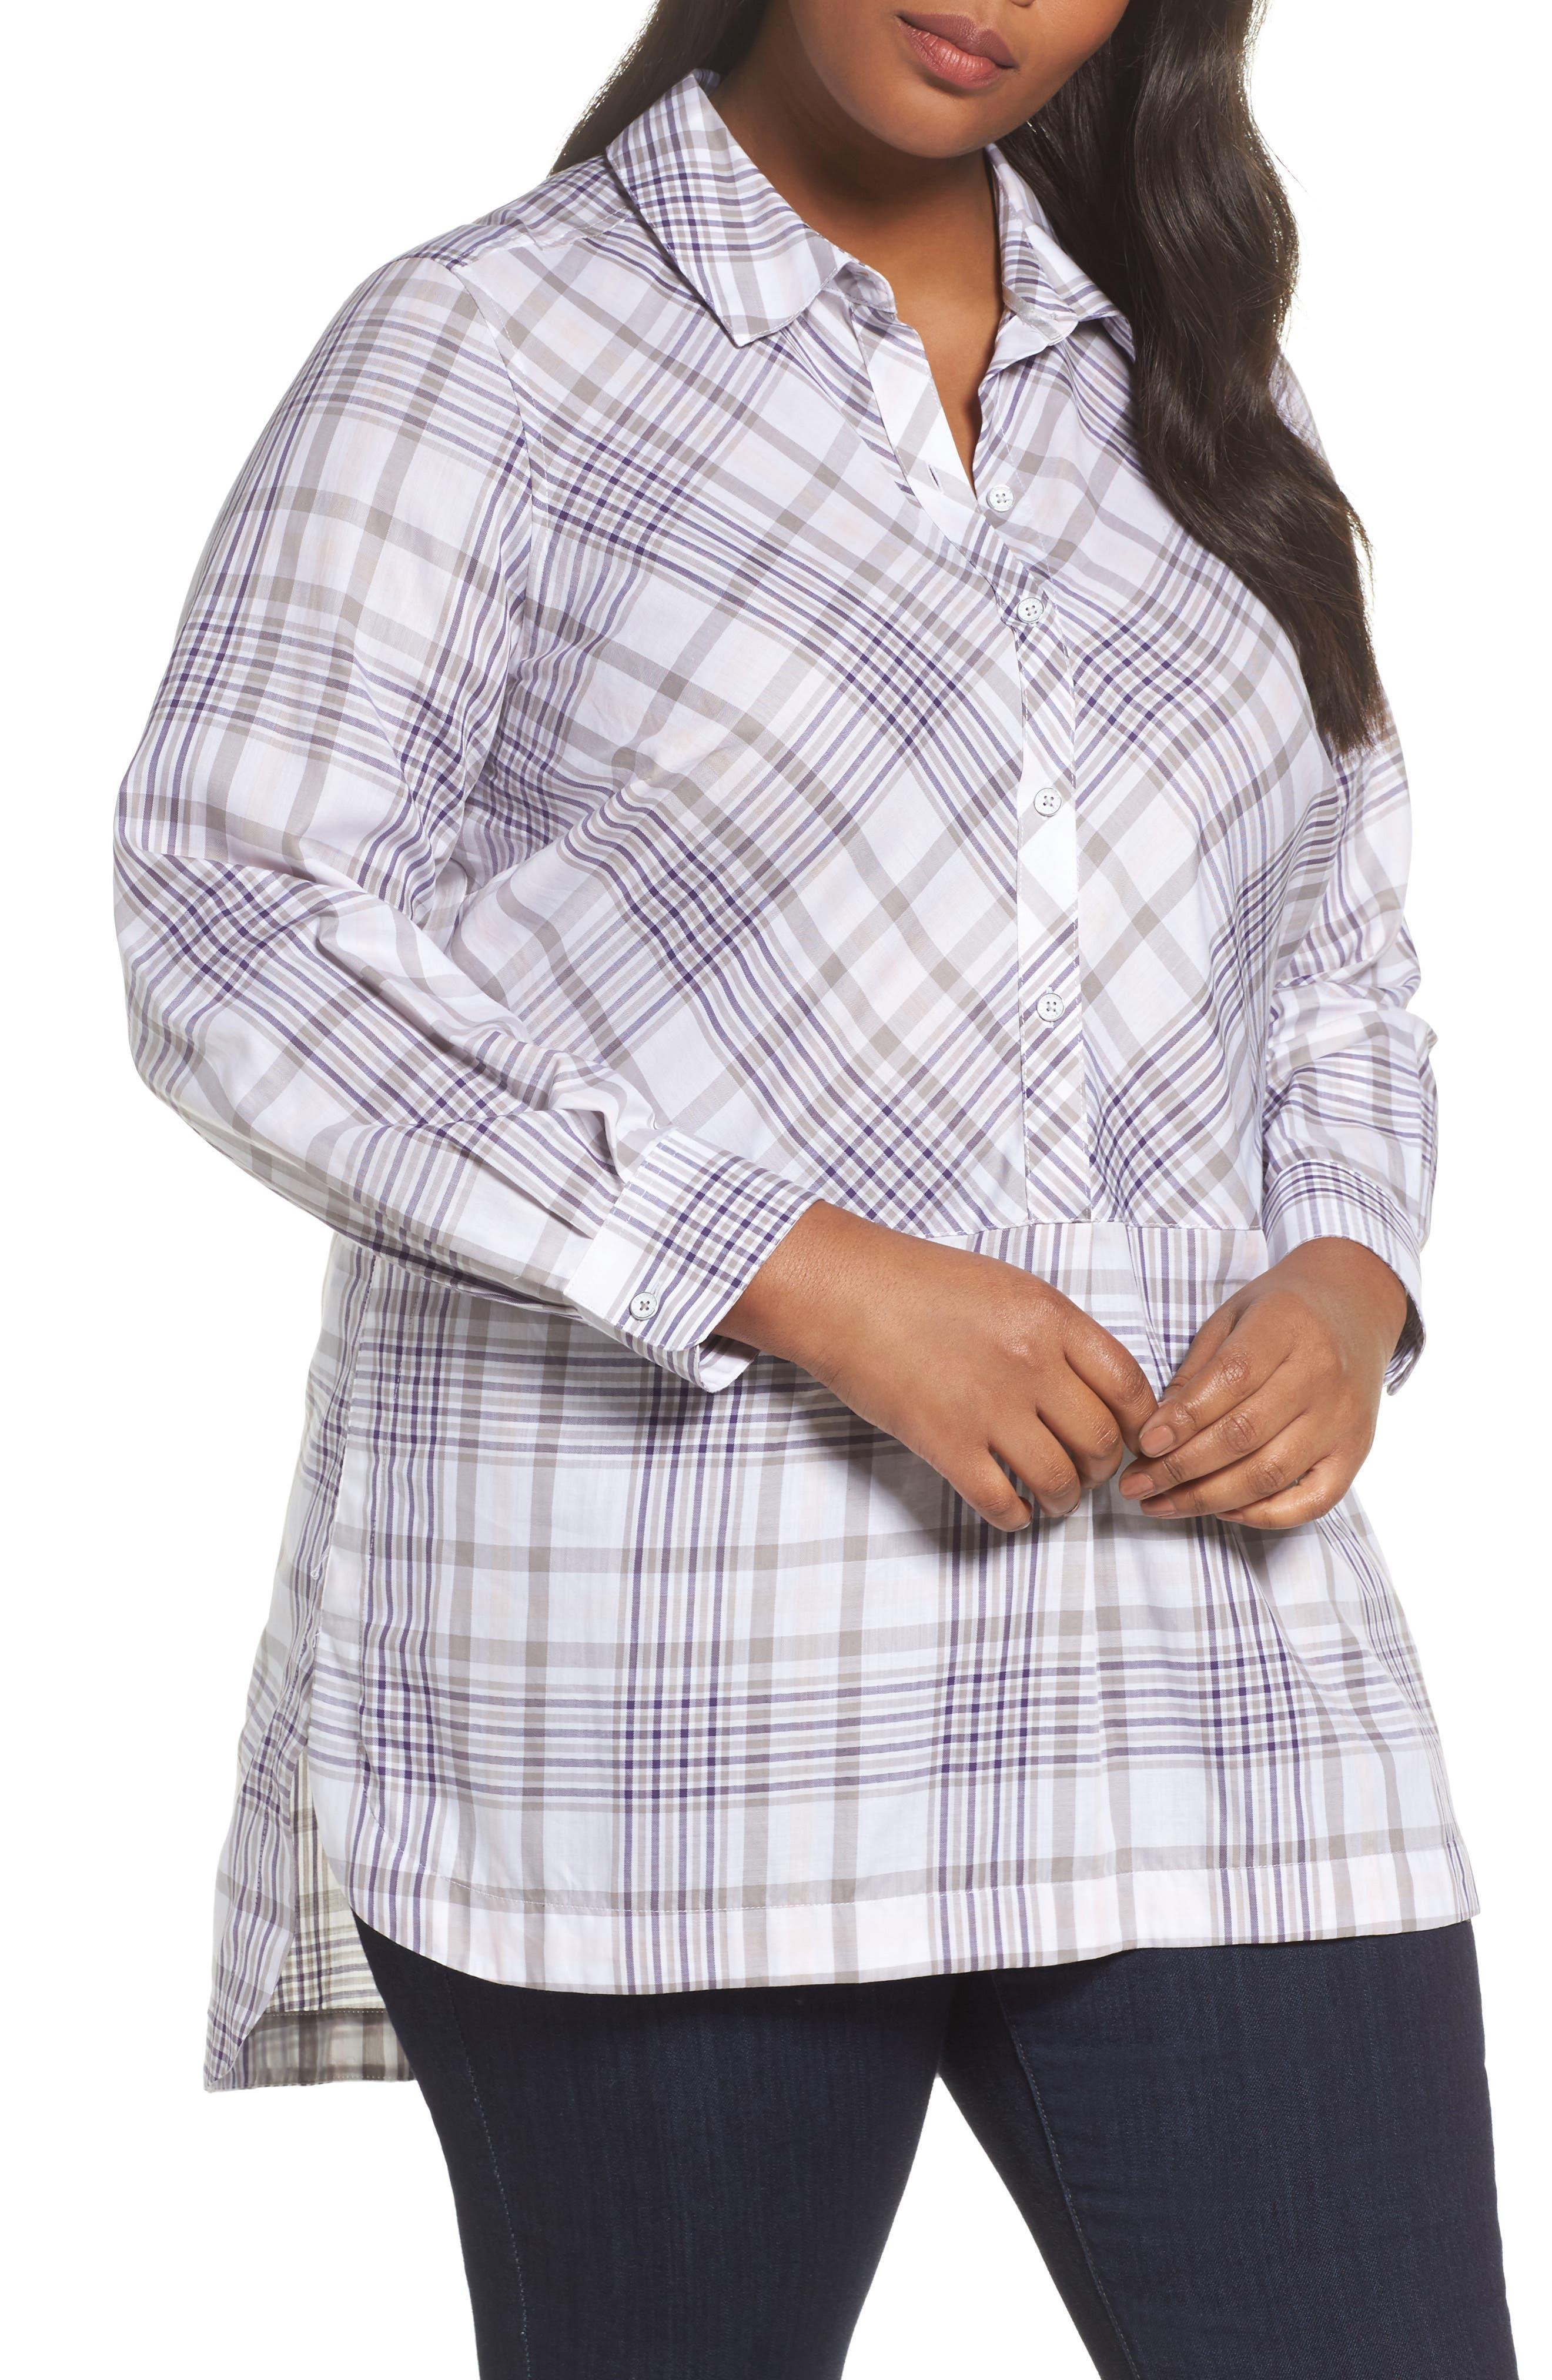 Main Image - Foxcroft Maddy Winter Plaid Shirt (Plus Size)